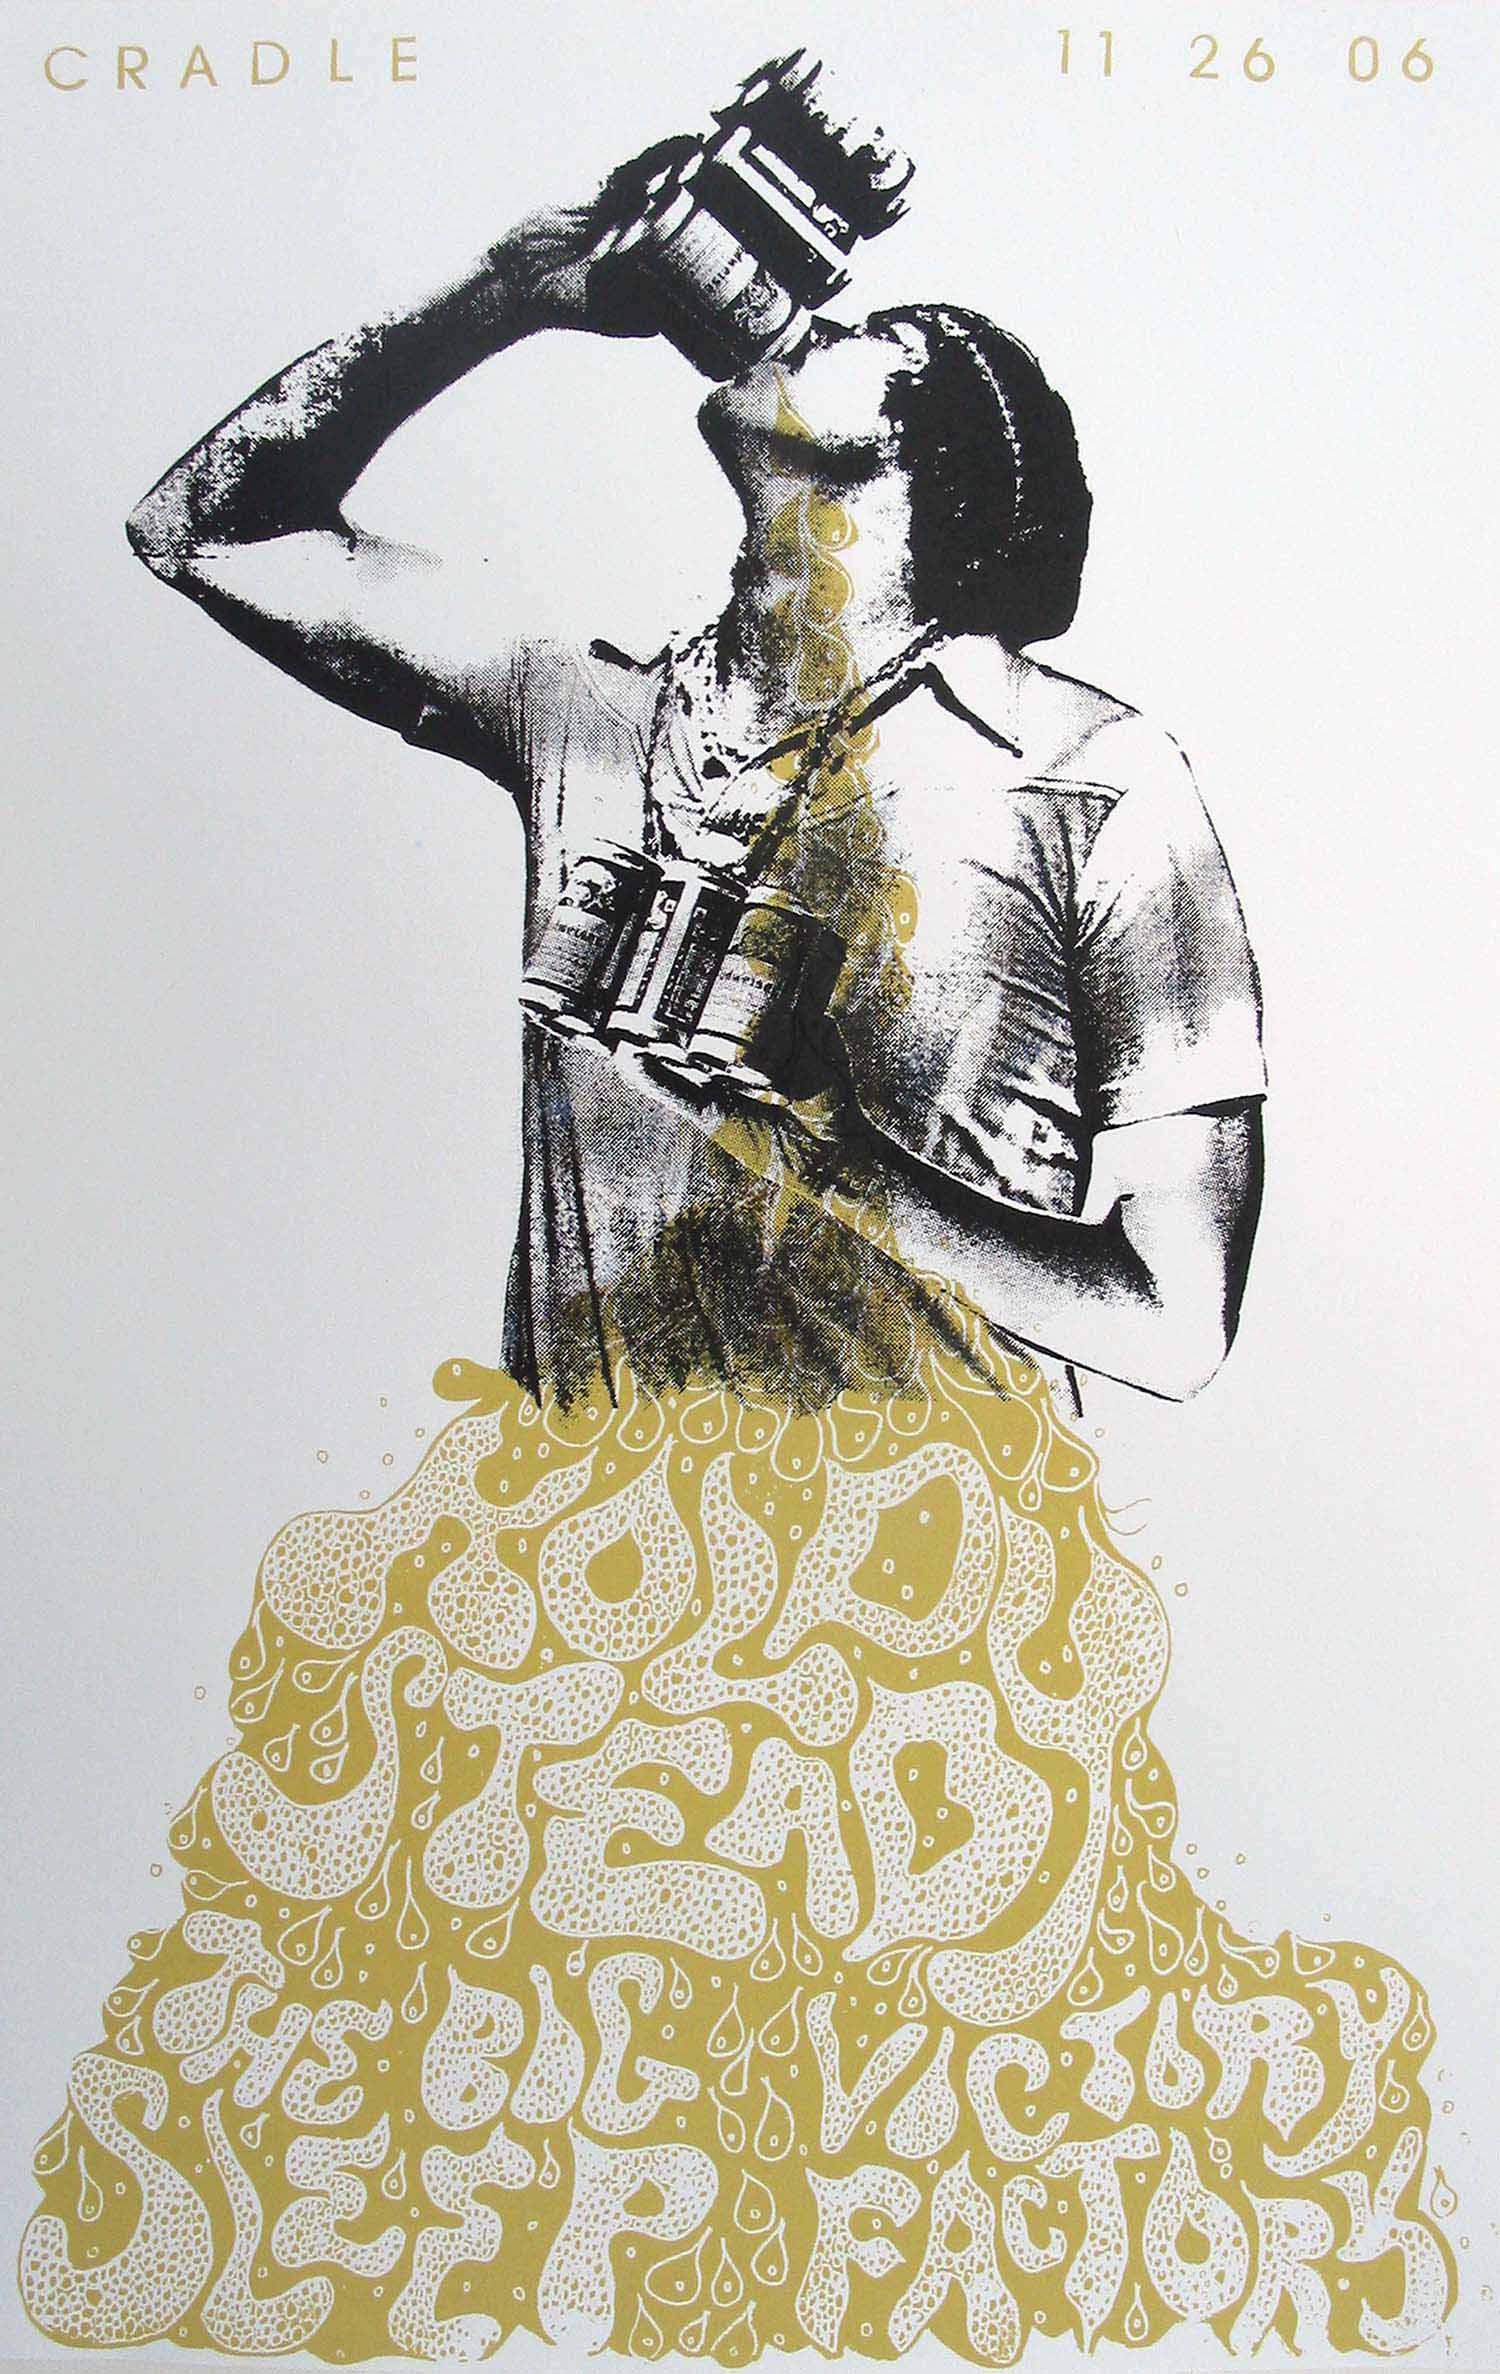 Hold Steady - The Big Sleep - Victory Factory